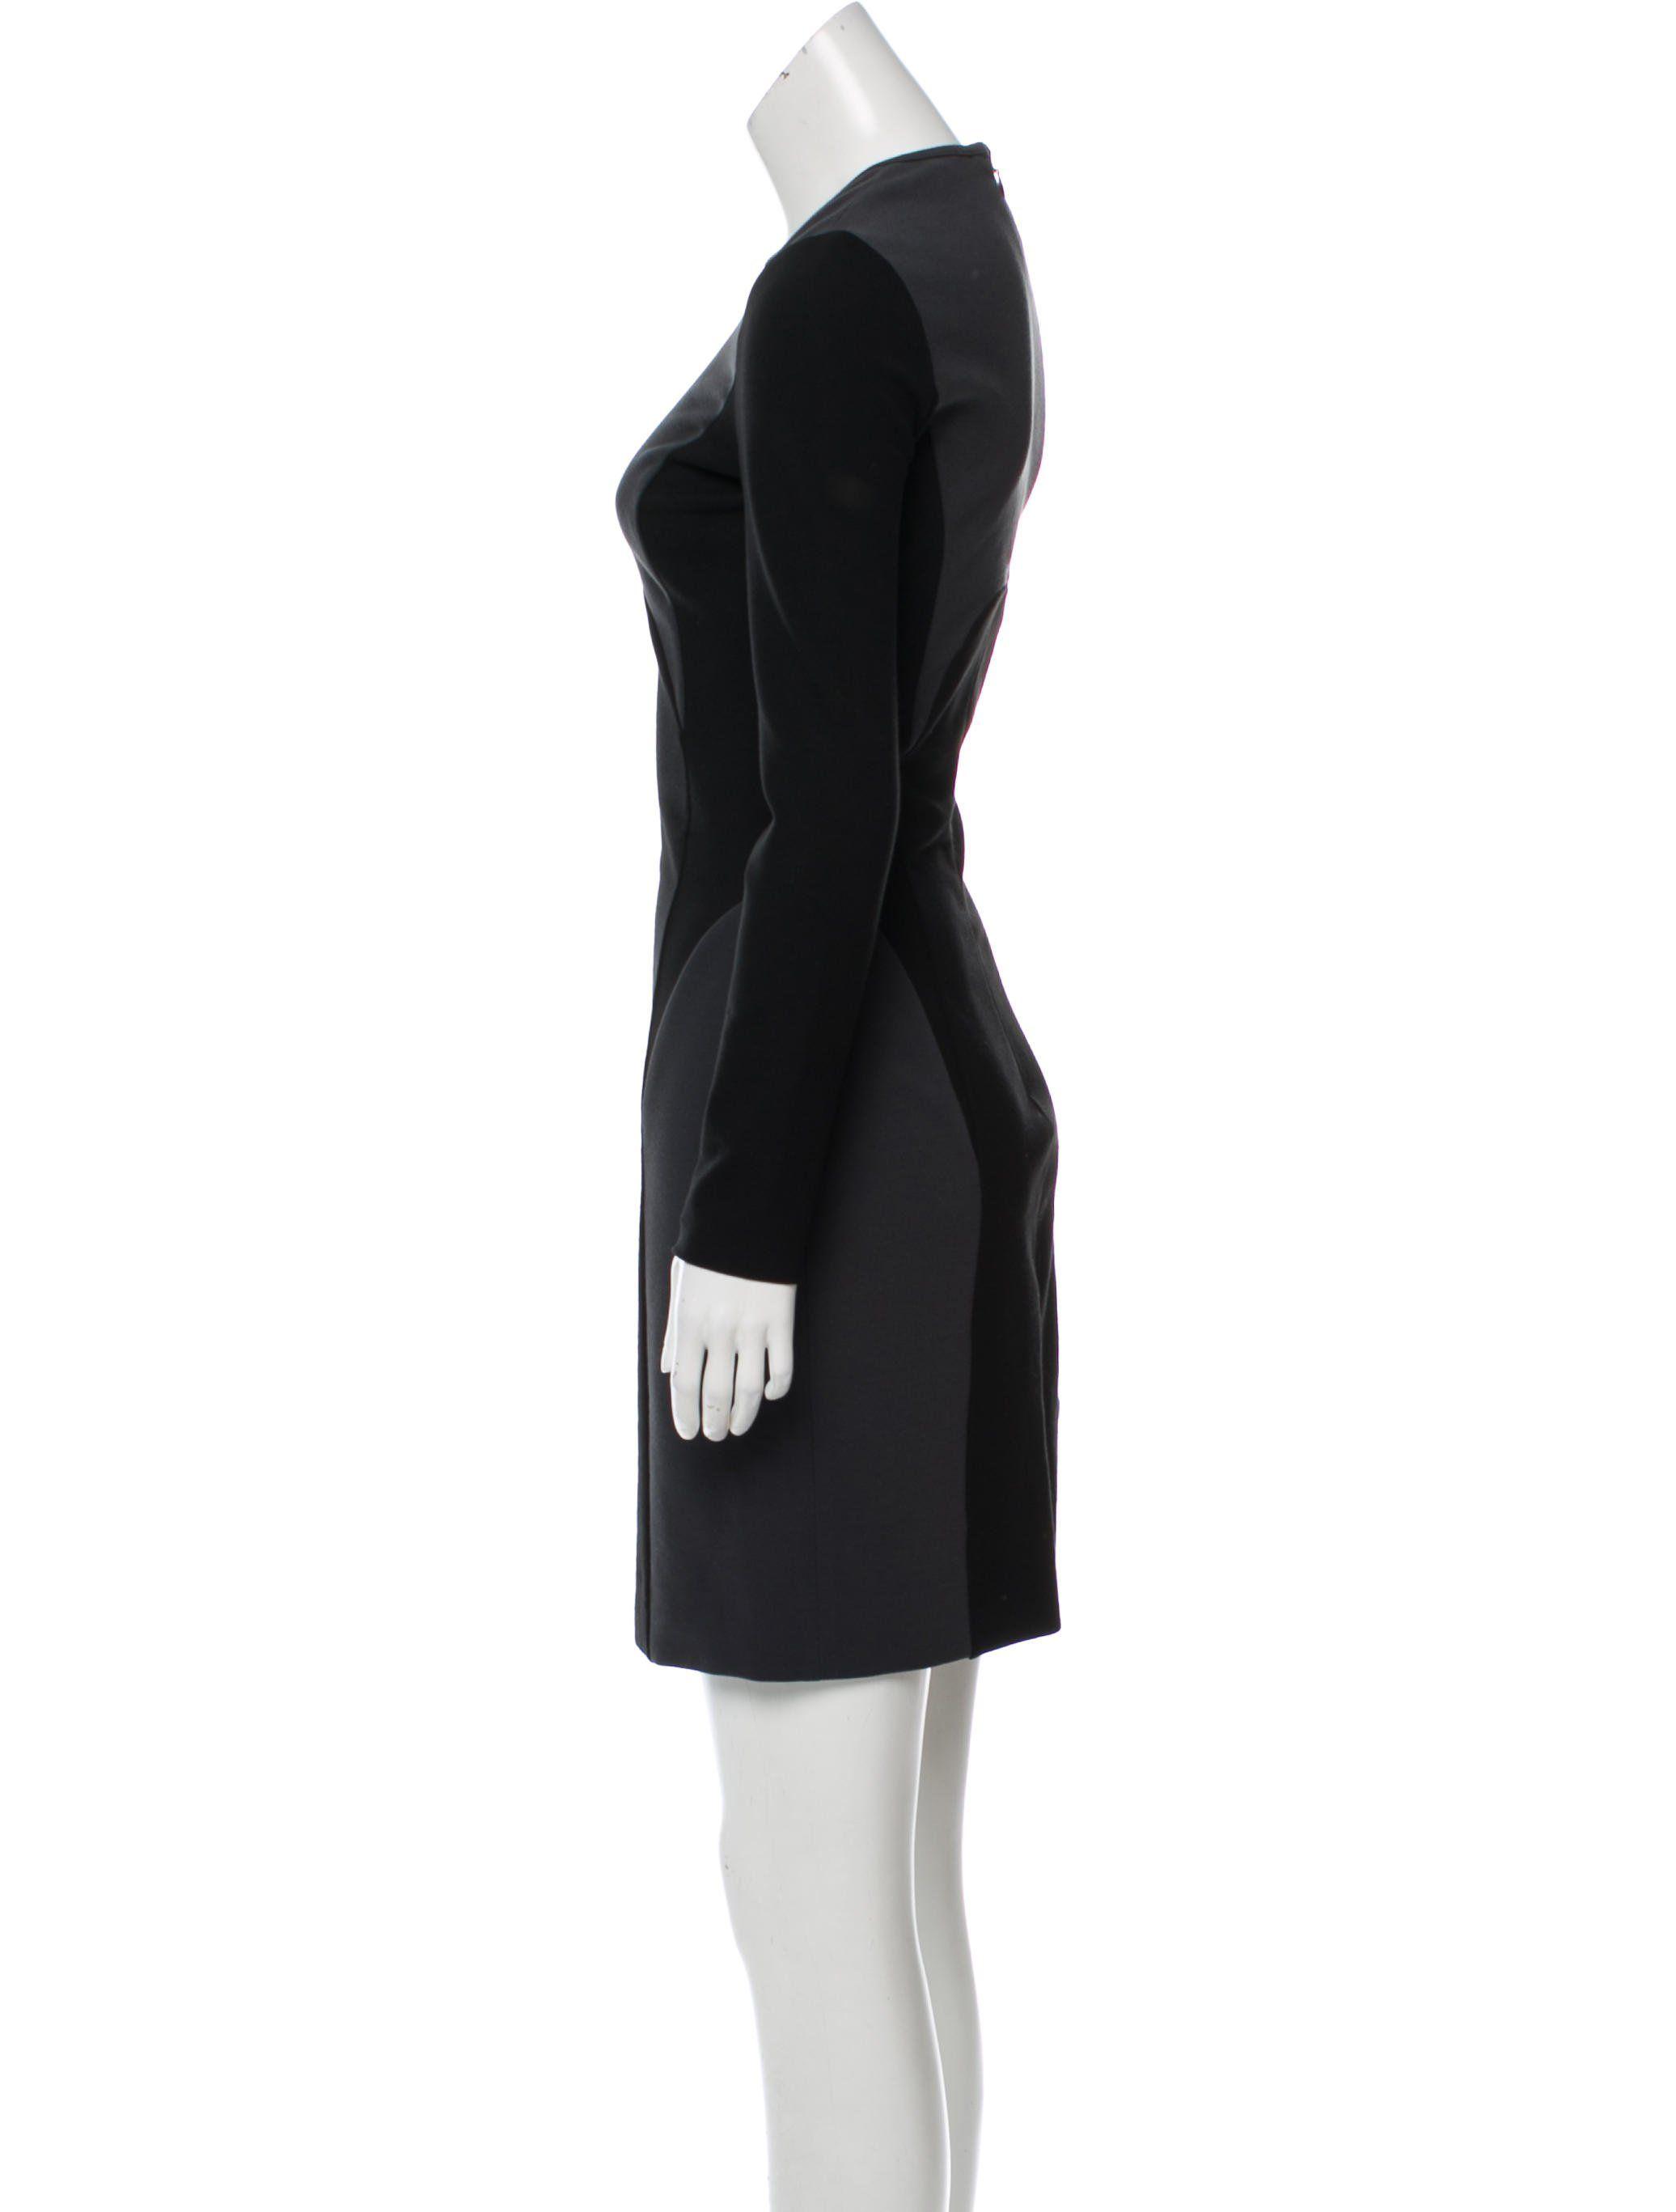 Michael kors long sleeve mini dress women fashion edgy pinterest